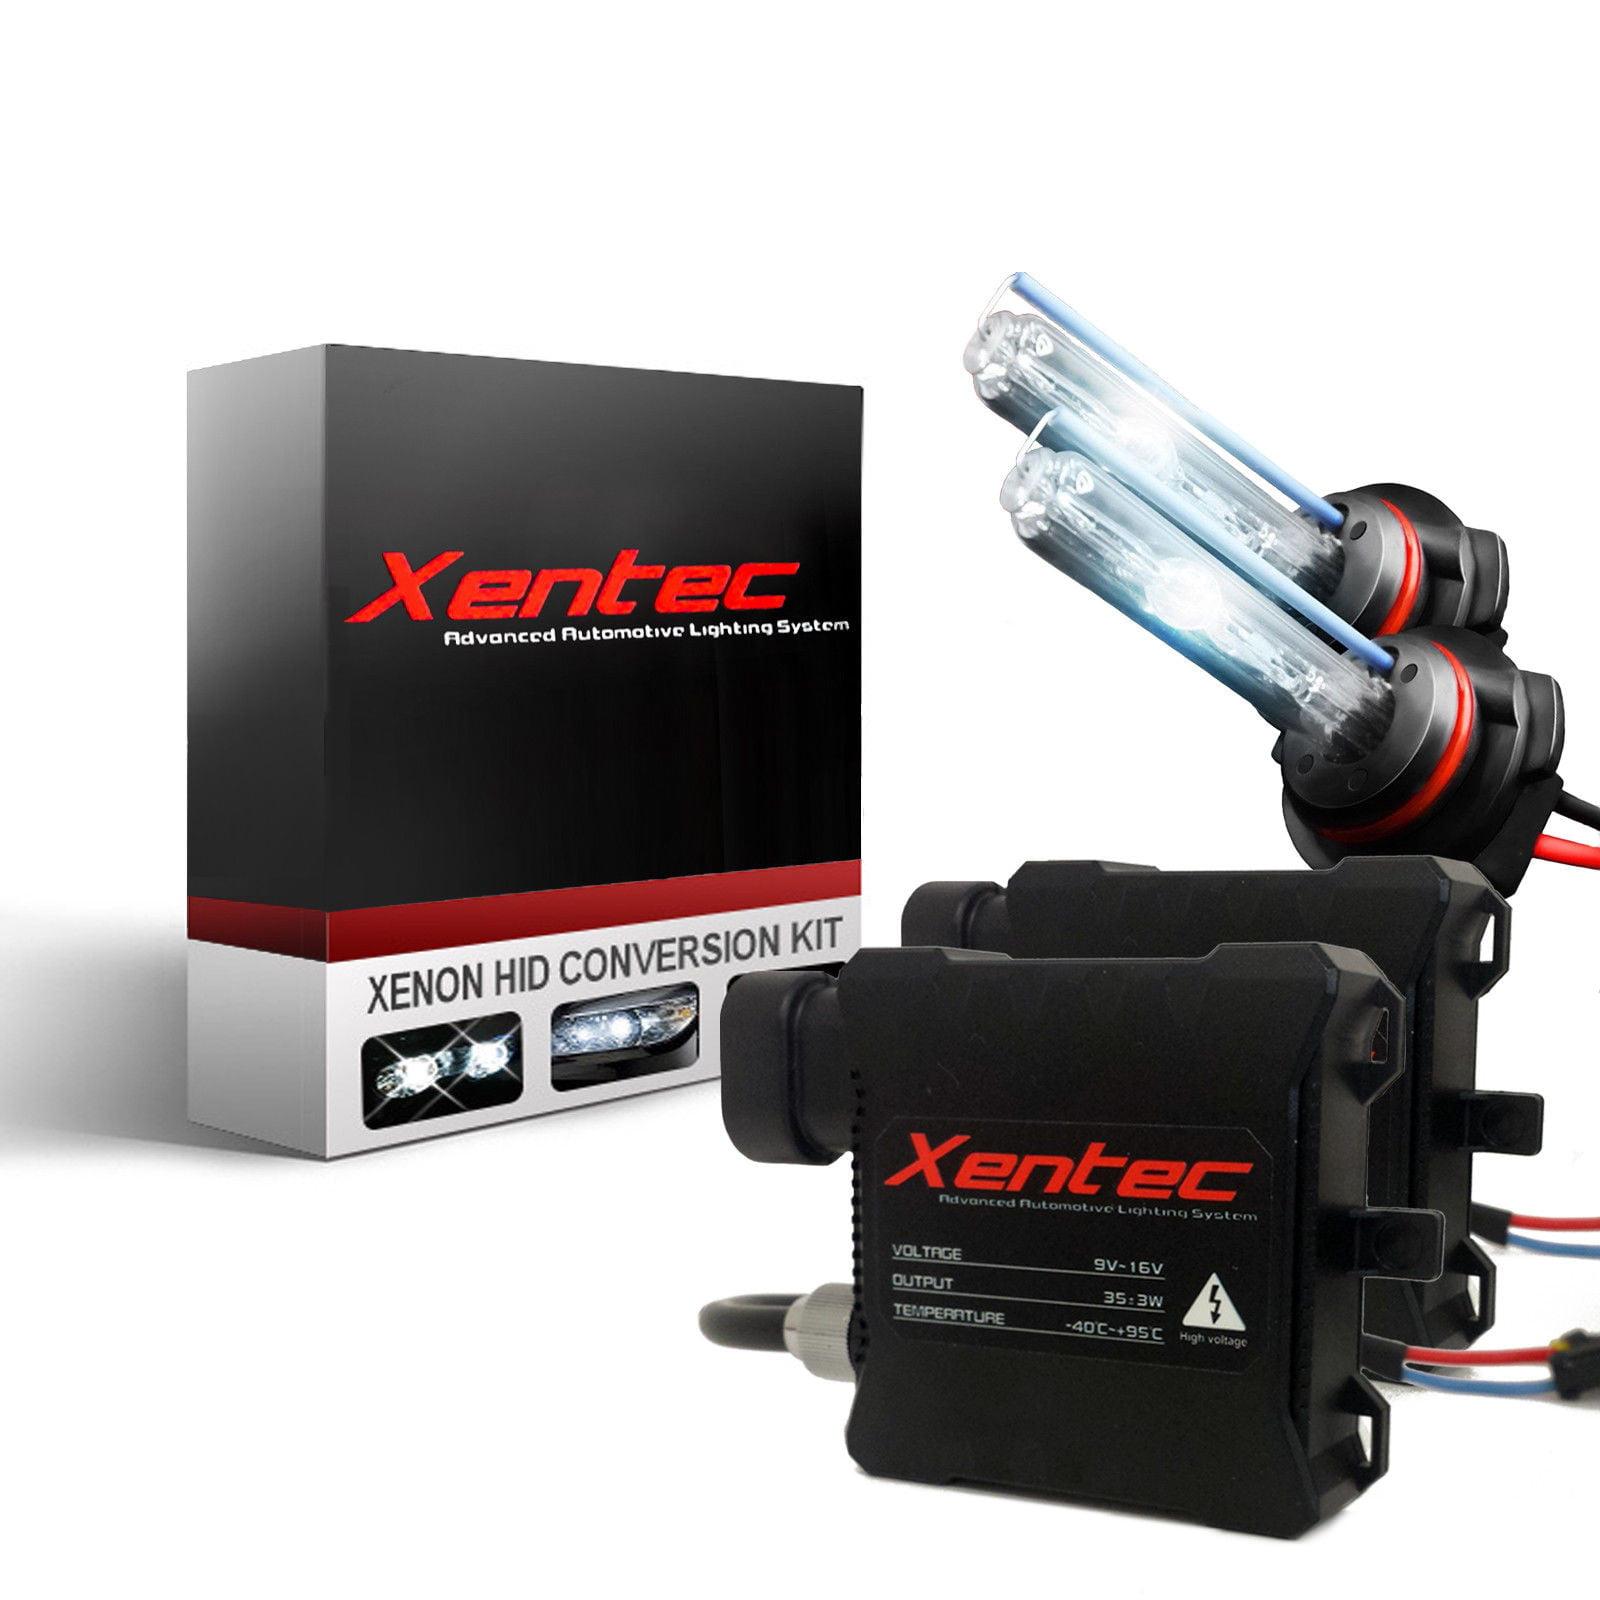 Xentec 5000K Xenon HID Kit for Toyota Prius 2001-2009 Headlight 9003 H4 Super Slim Digital HID Conversion Lights